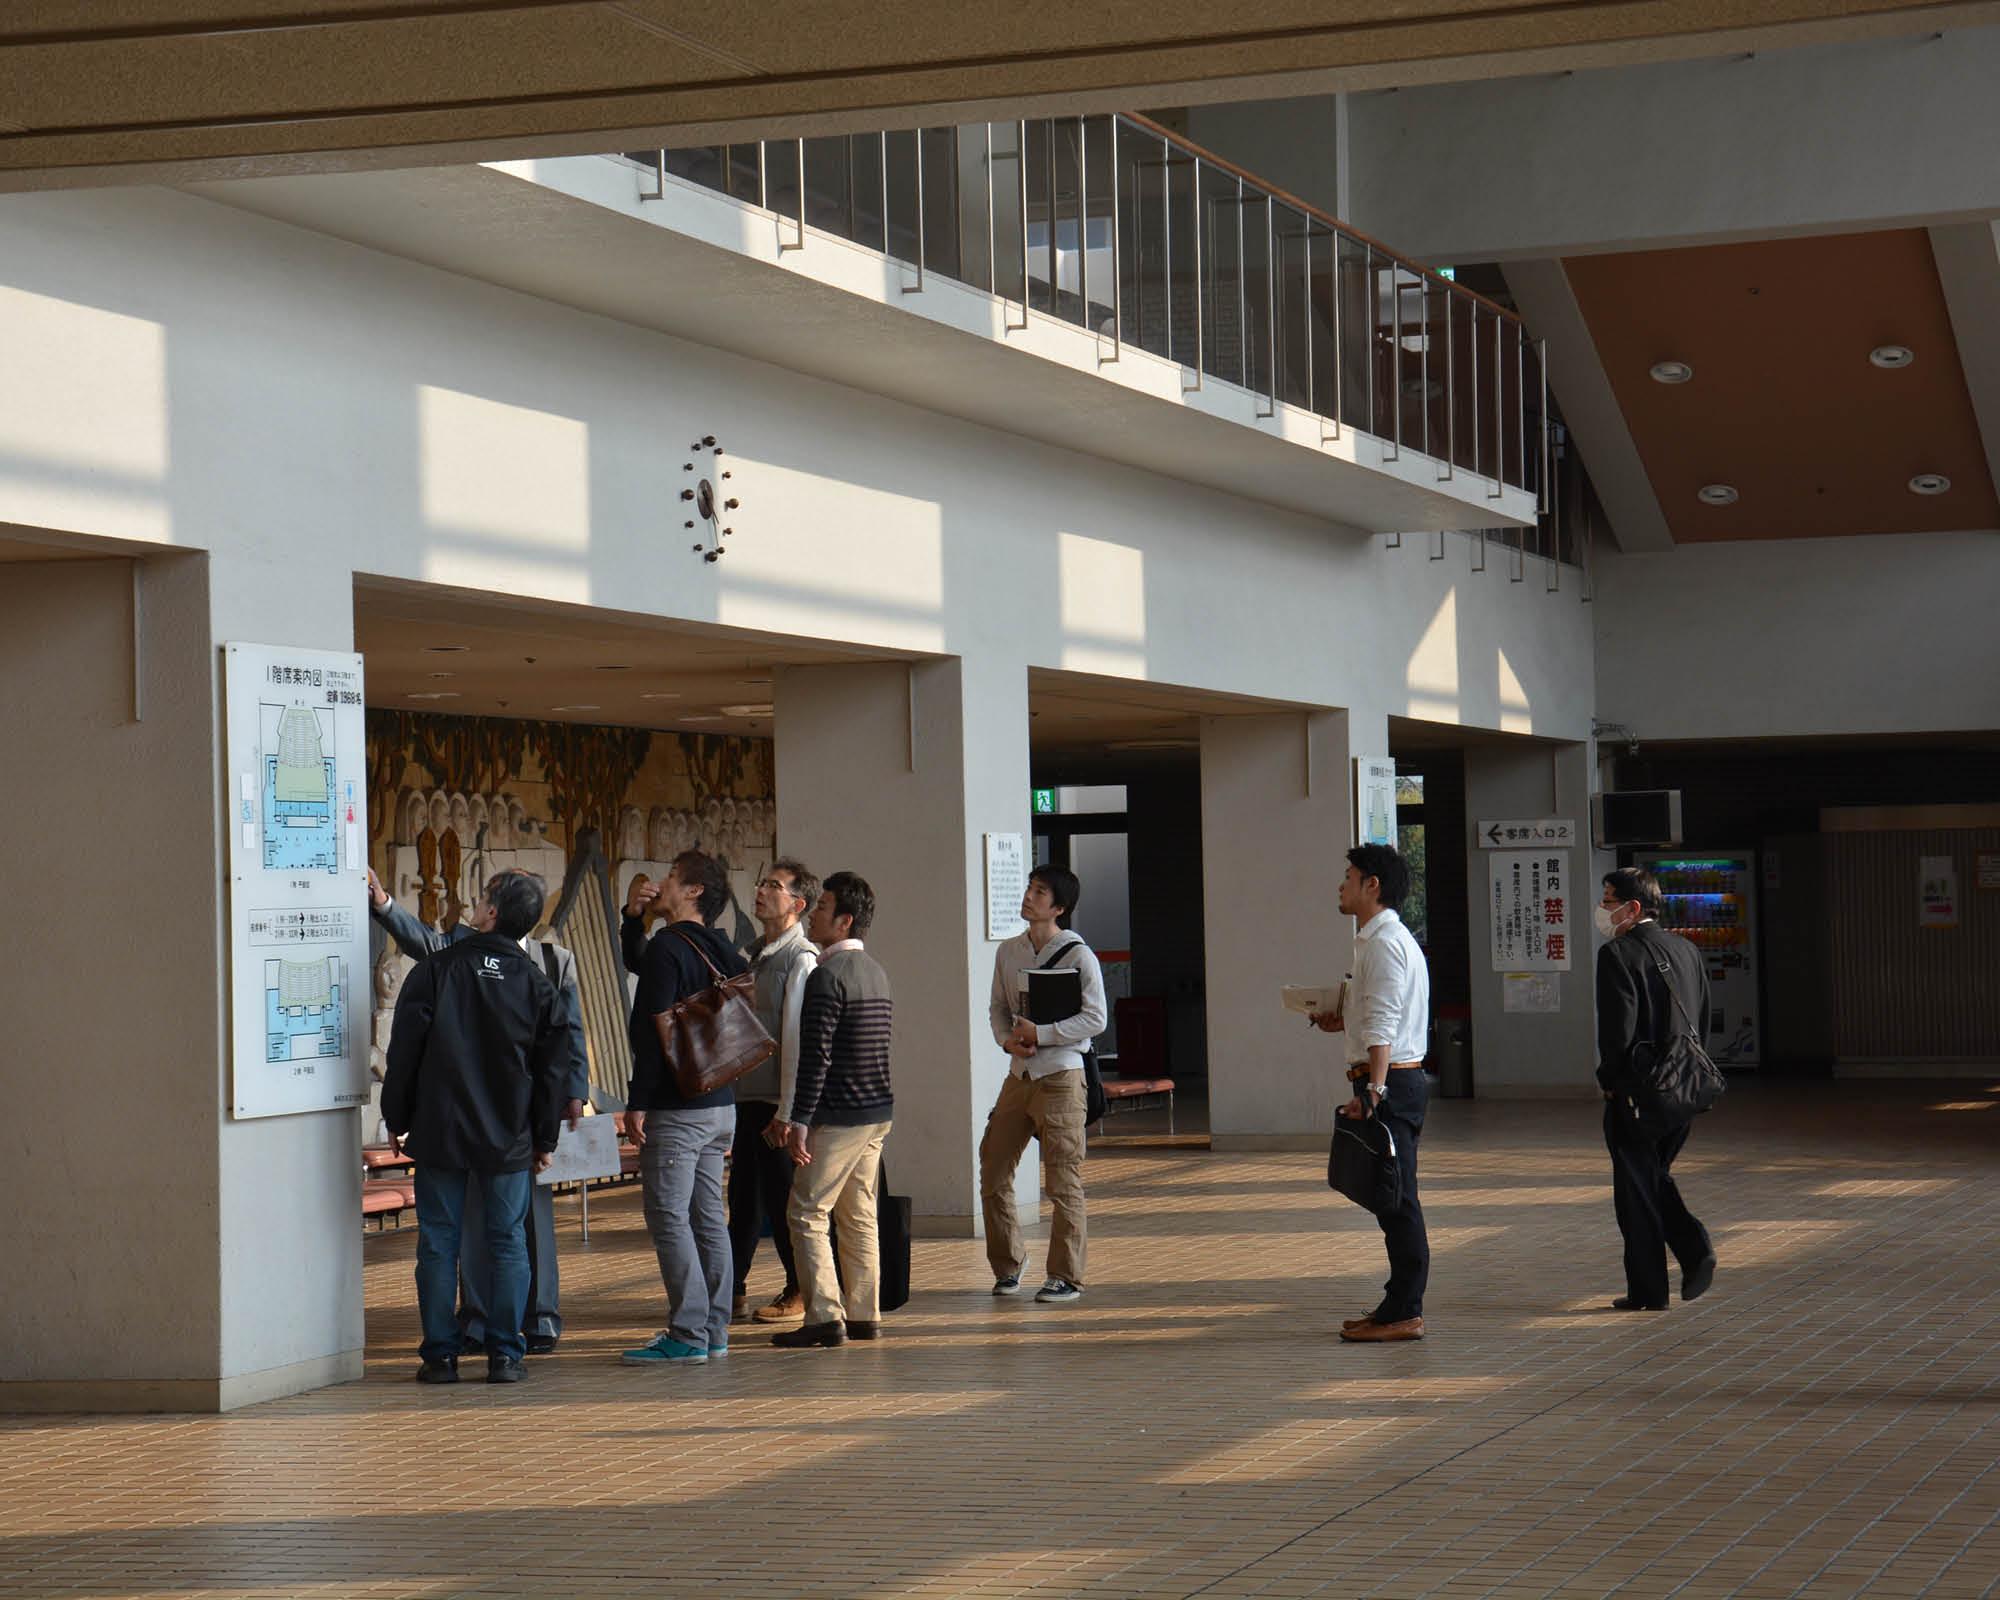 https://www.shizuoka-cb.com/wp-content/uploads/2021/03/photo-supports4.jpg